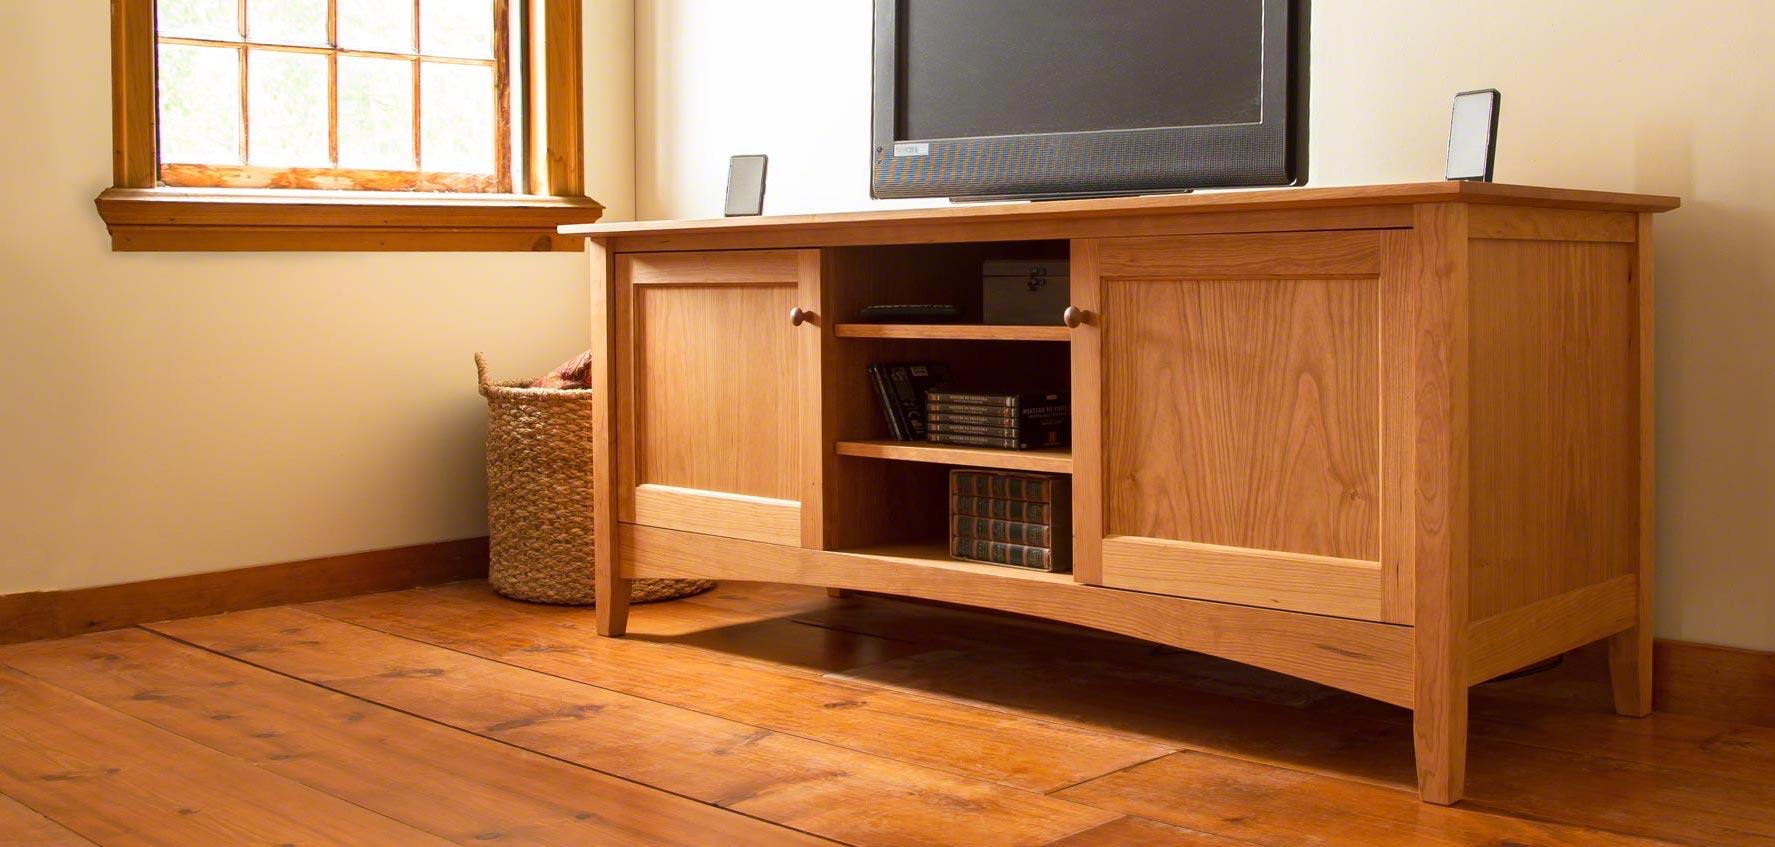 Lauren Tv Stand Modern Wood Design (View 10 of 10)